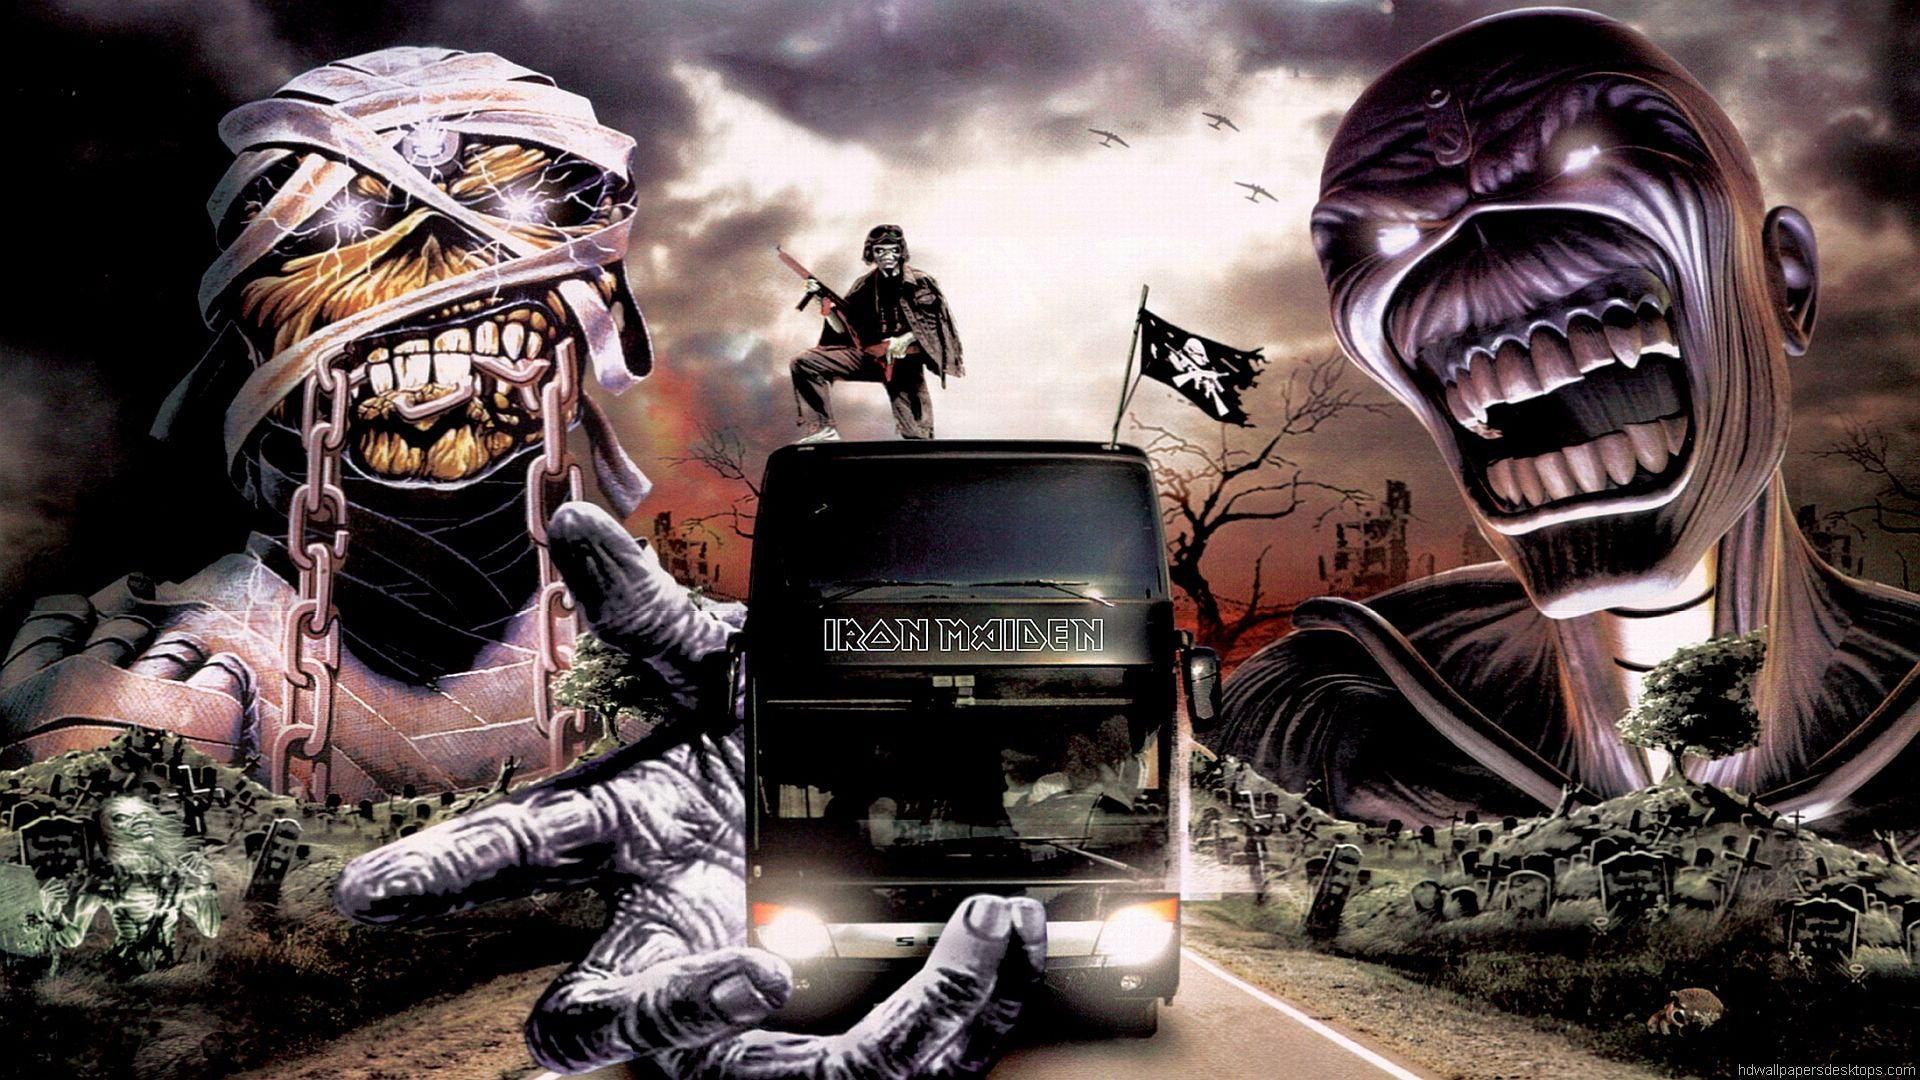 Iron Maiden Wallpaper Iron Maiden Hd Wallpaper Background